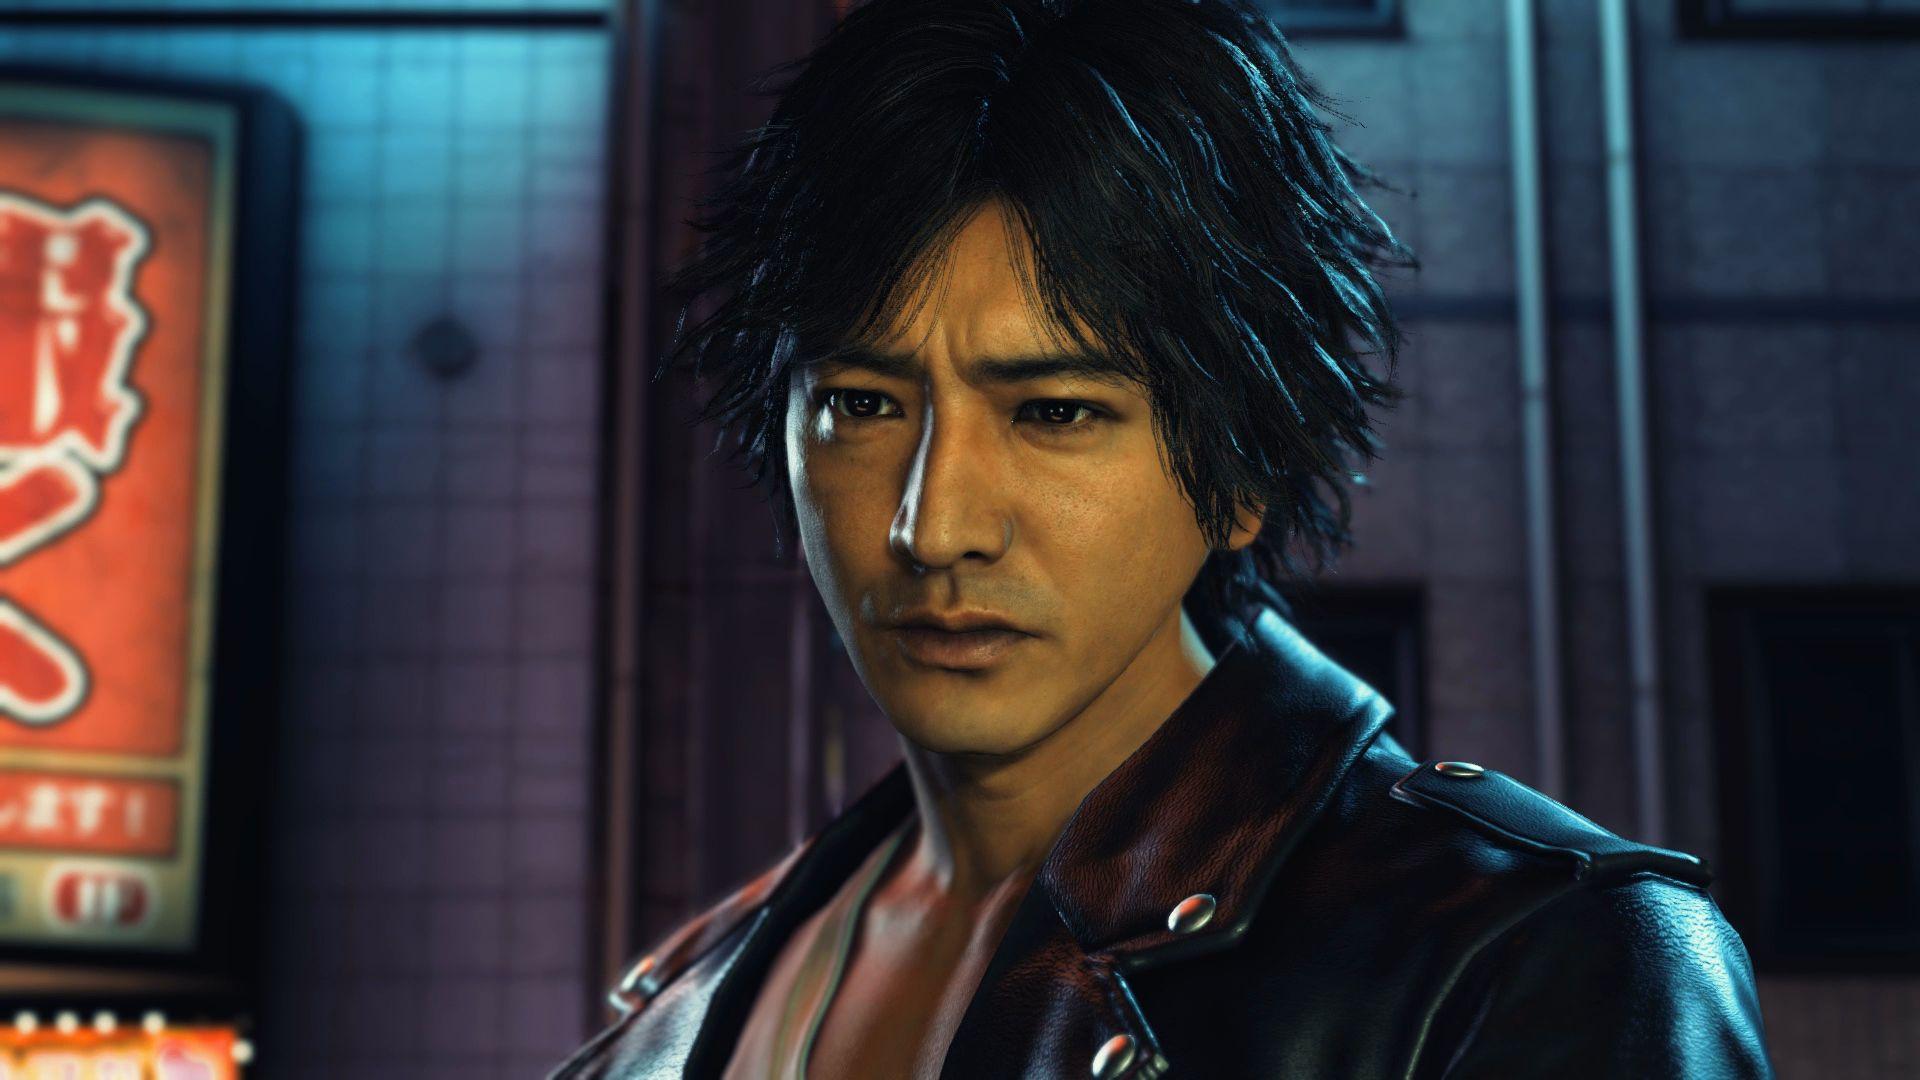 Judgment, PS4, Yakuza, Sega